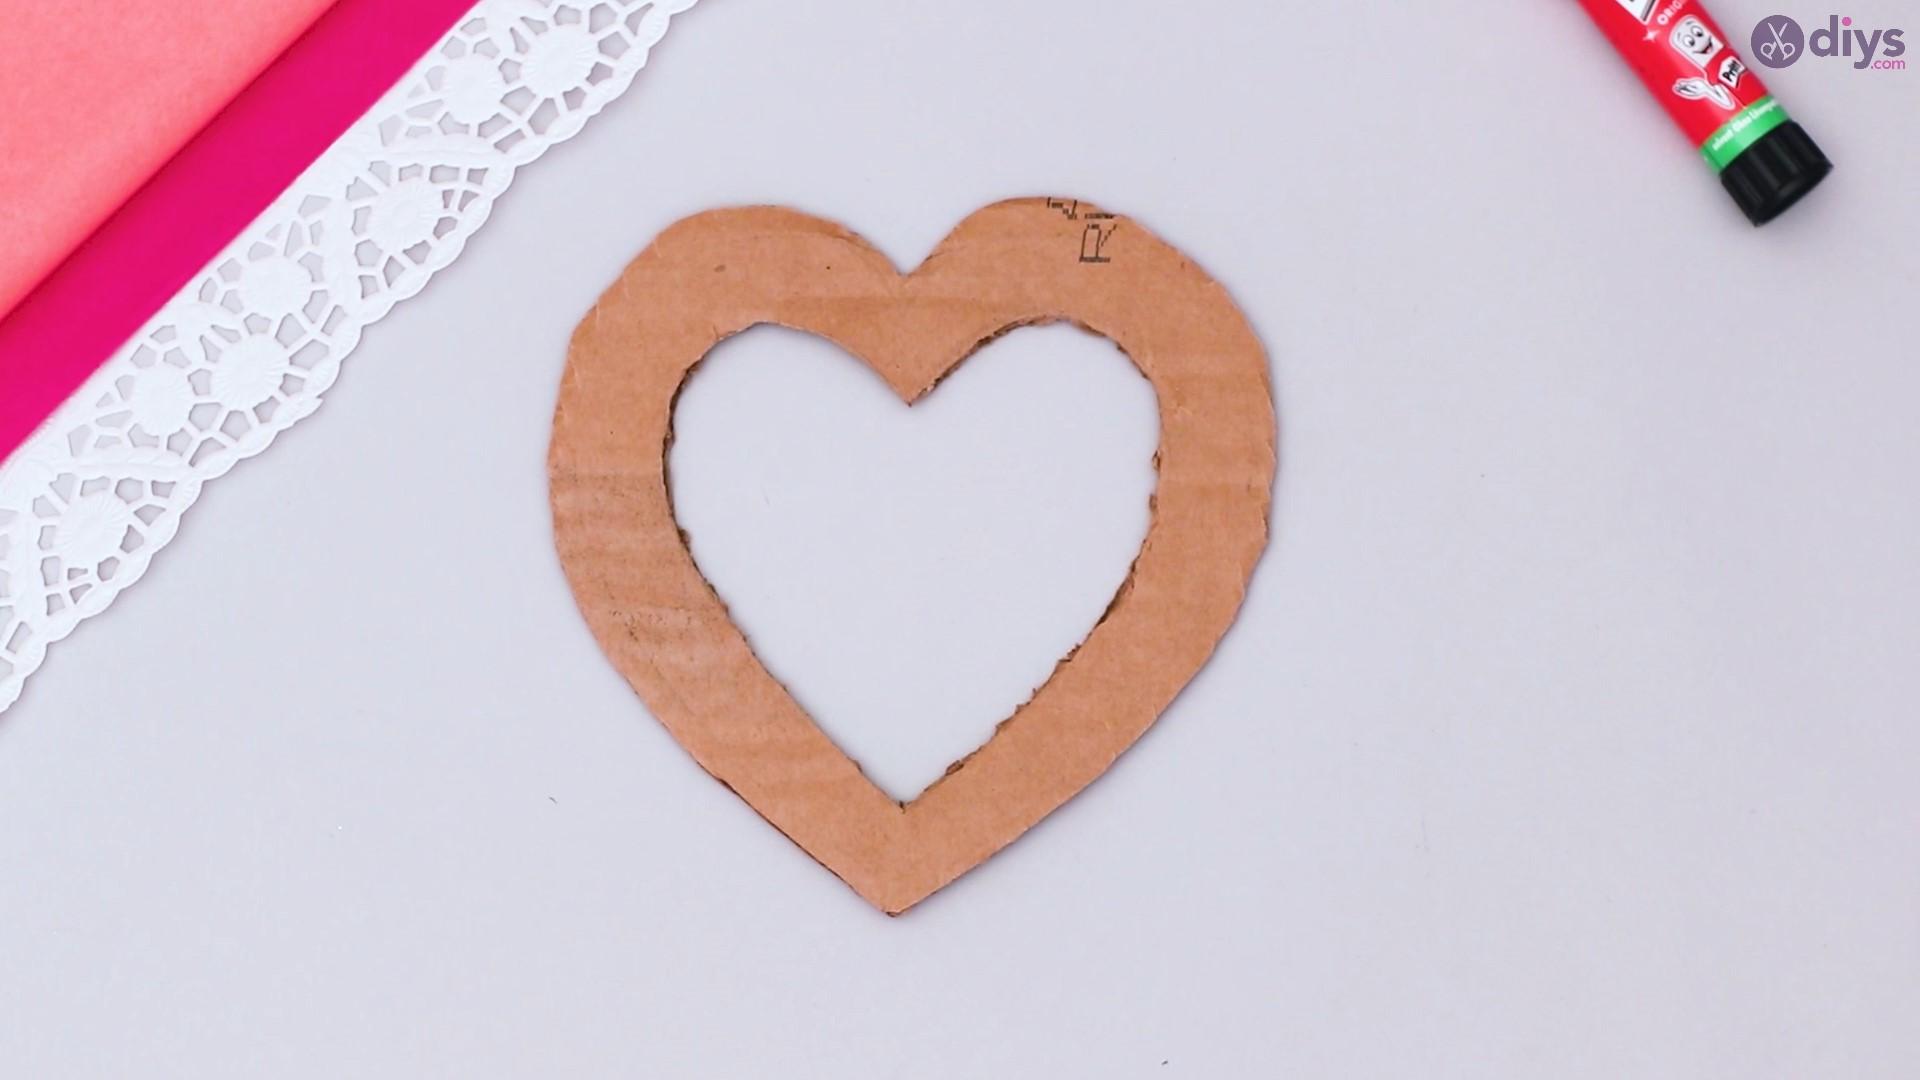 Diy tissue paper puffy heart step 1 (4)